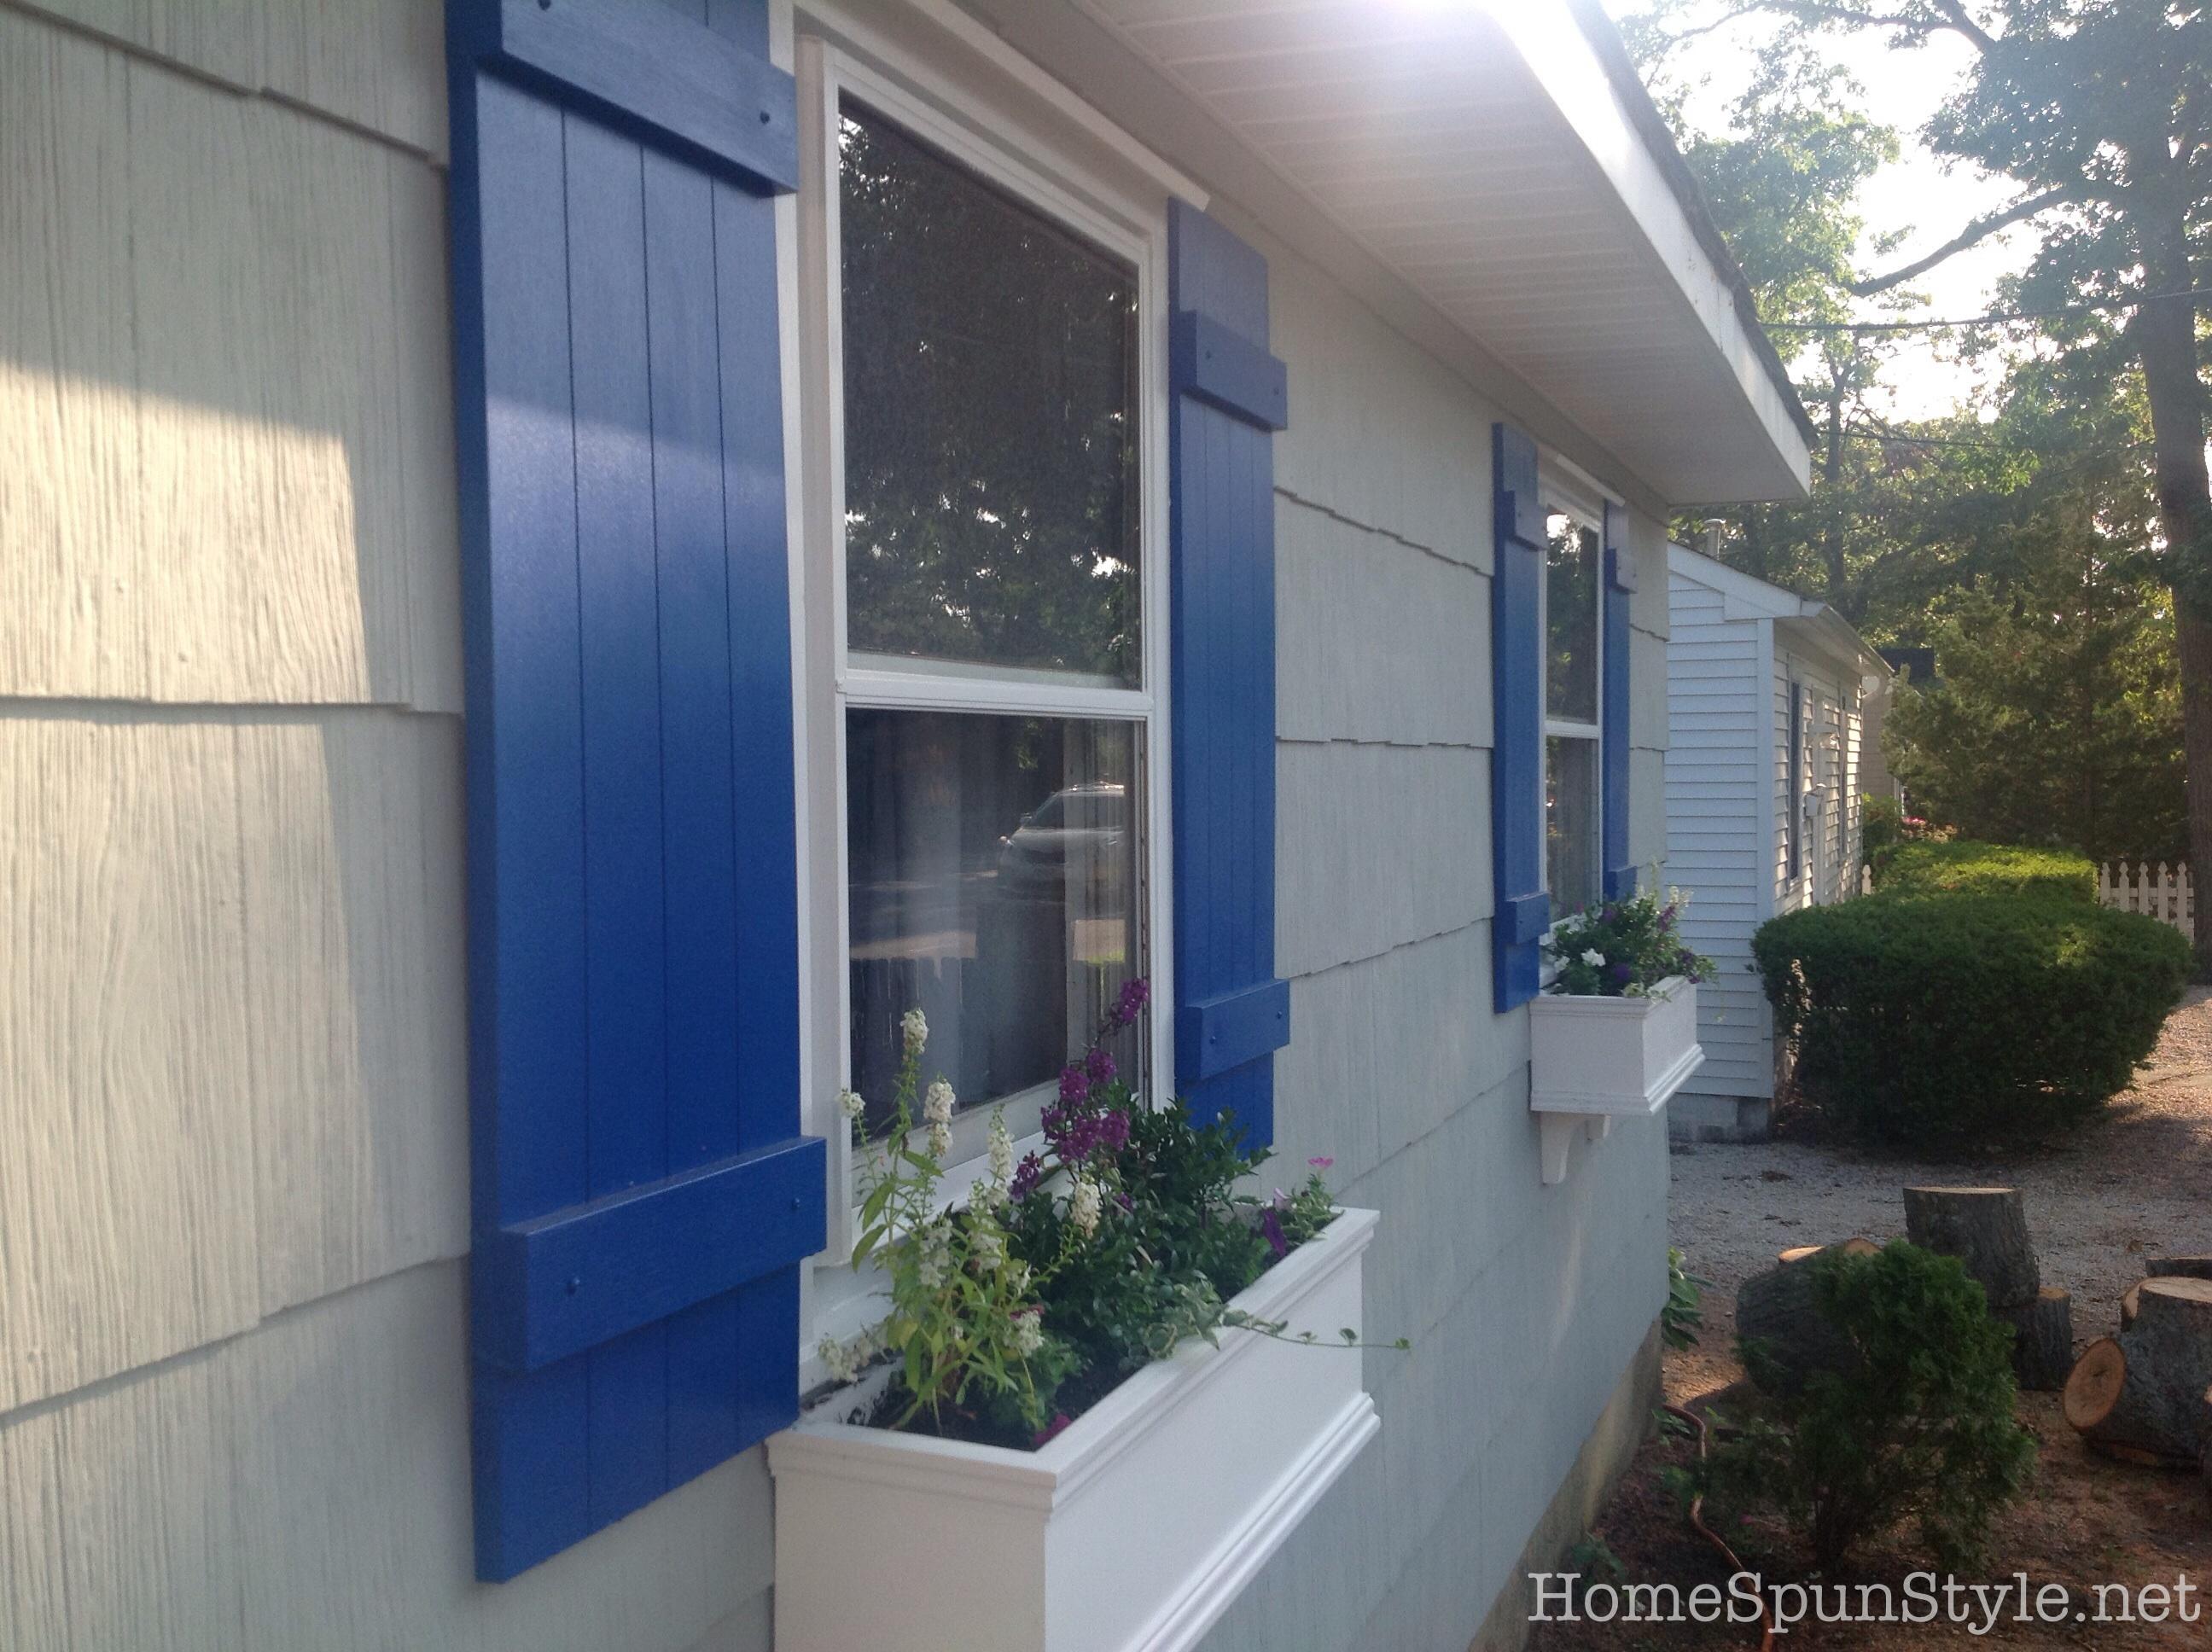 Miraculous Beach House Exterior Color Scheme Home Spun Style Largest Home Design Picture Inspirations Pitcheantrous